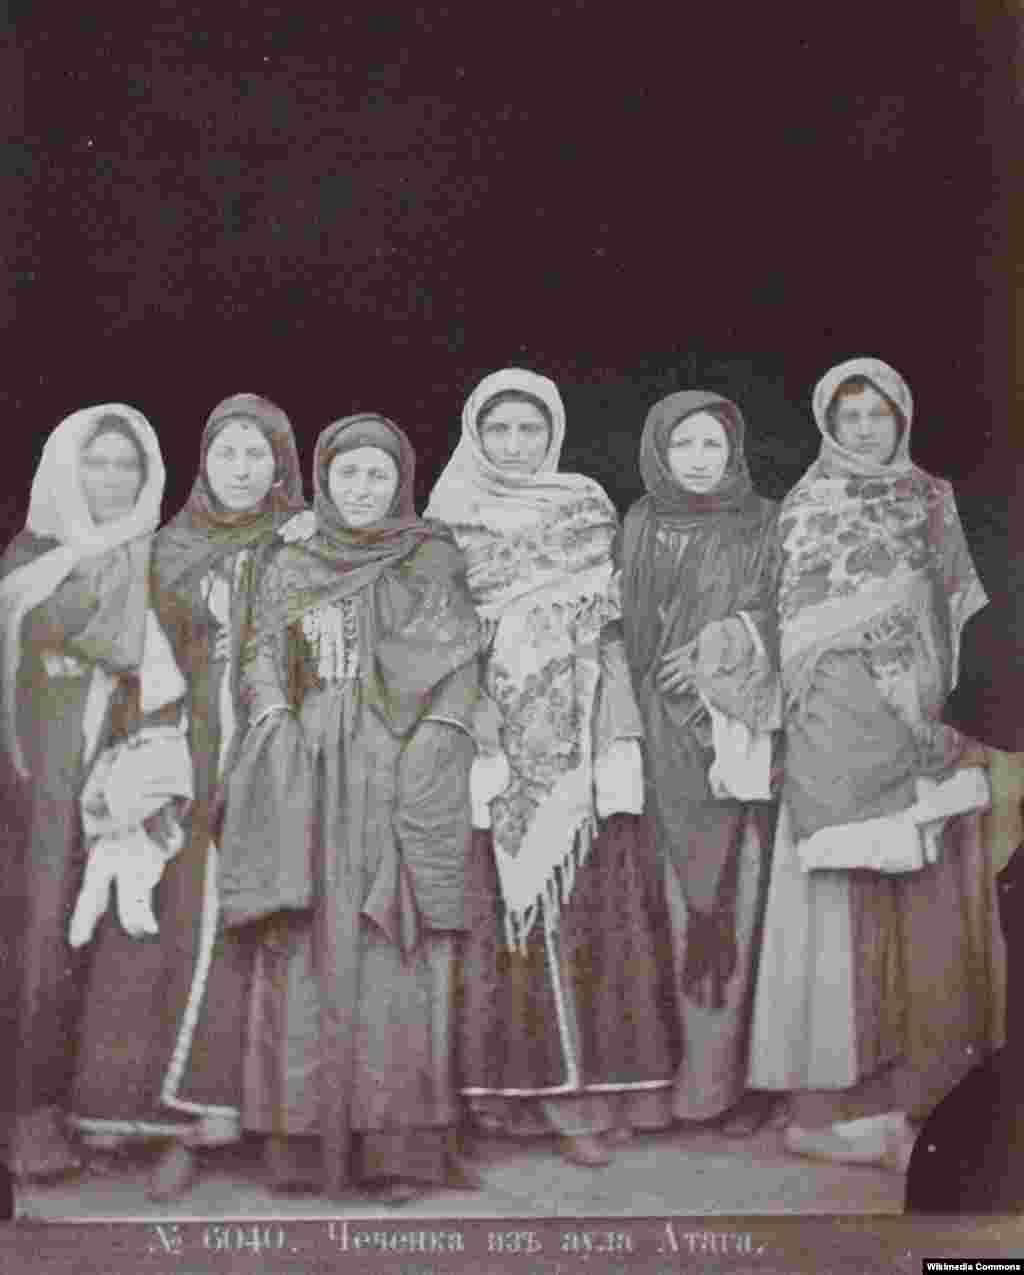 Чеченки из аула Атаги. Фотография Д. Ермакова